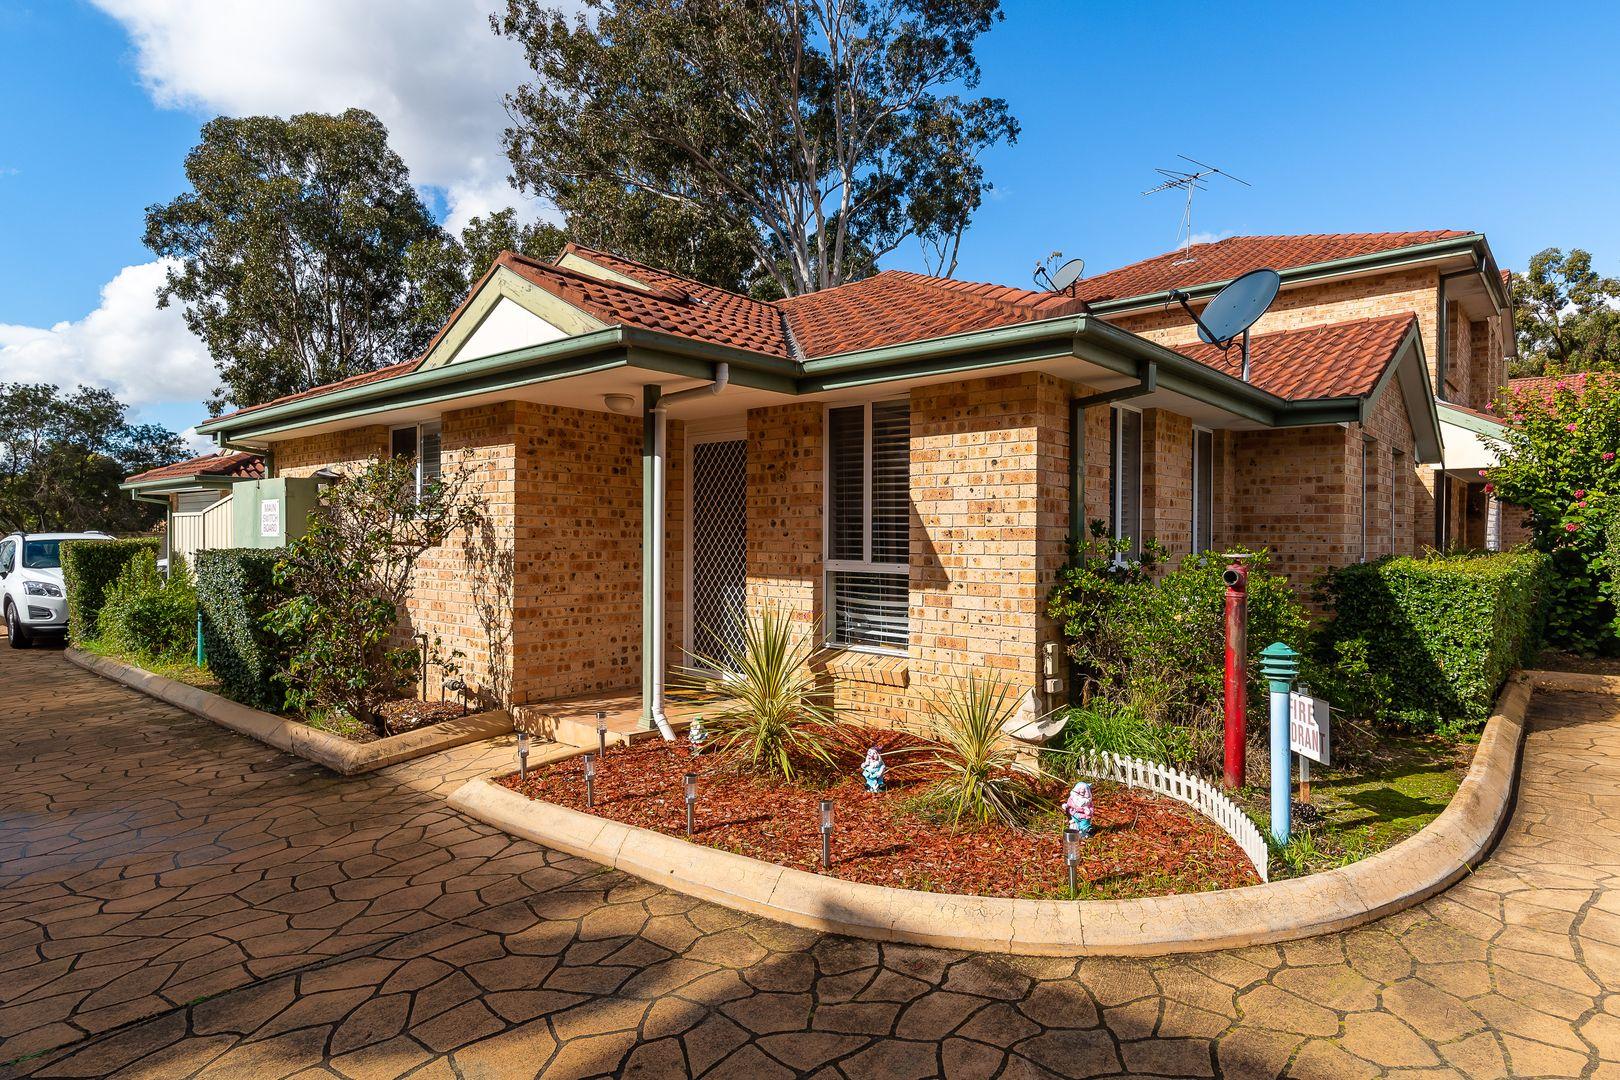 18/59-61 Devenish Street, Greenfield Park NSW 2176, Image 0